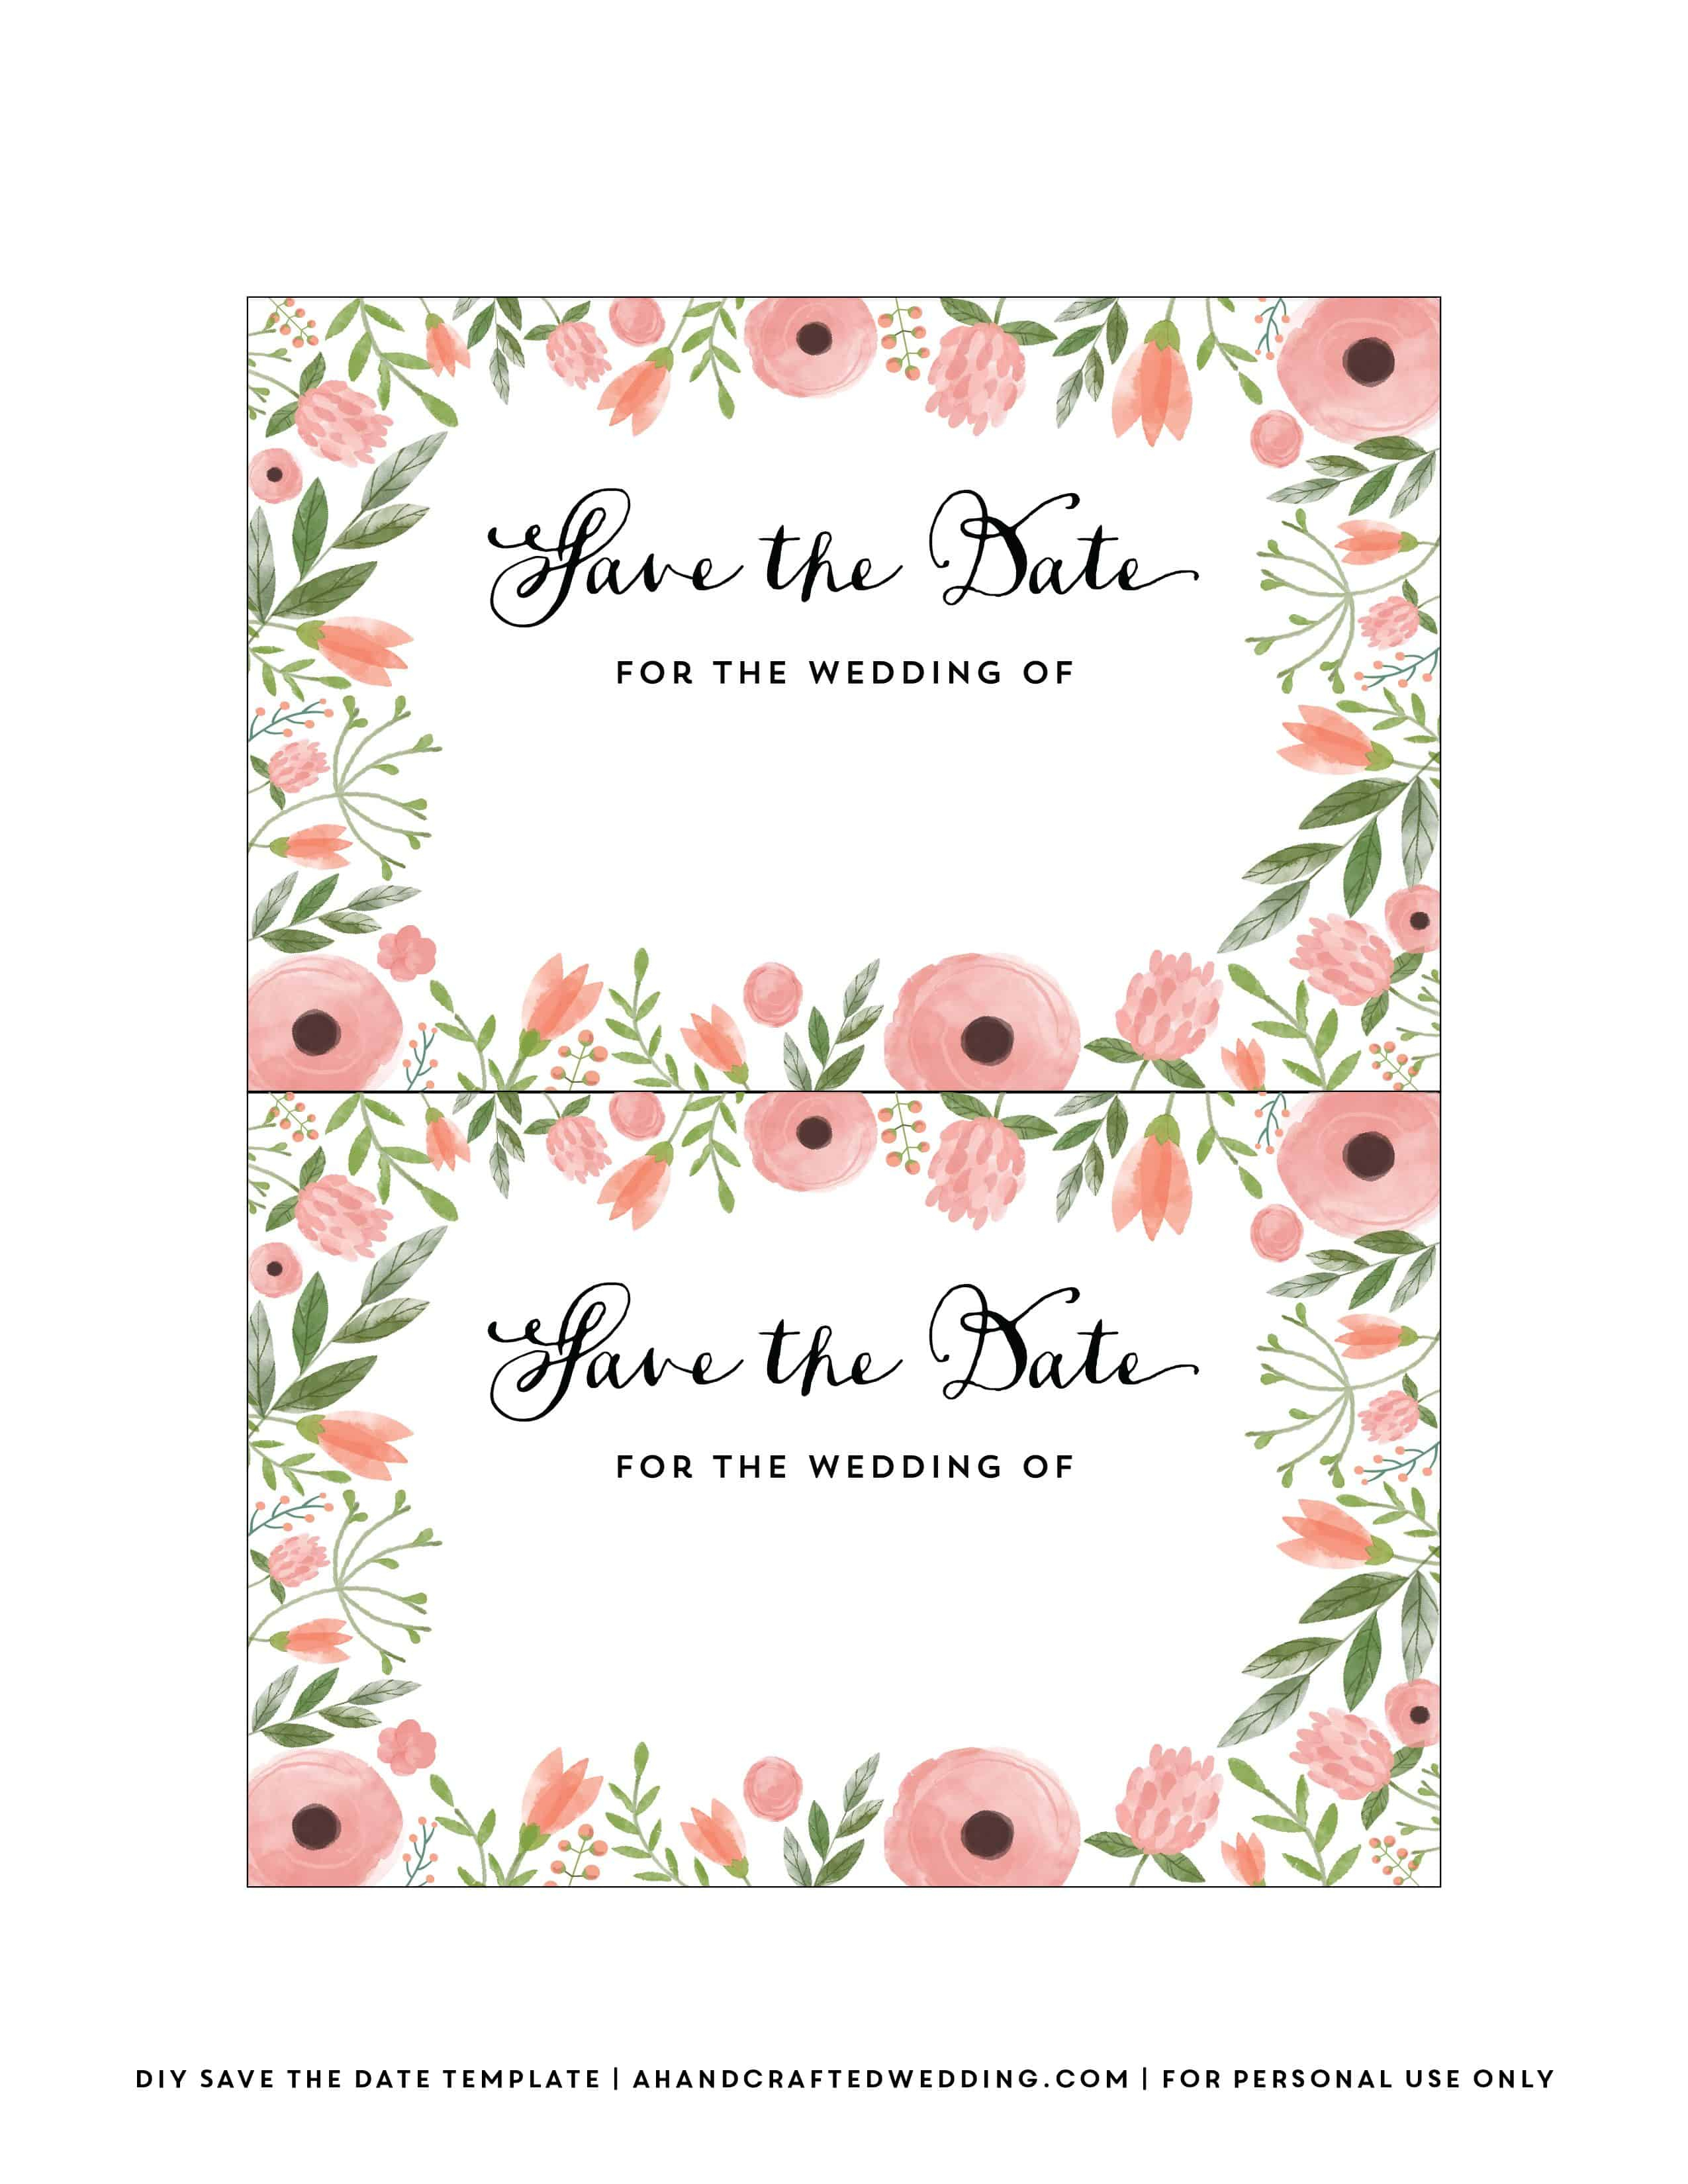 Diy Save The Date Postcard Free Printable   Mountain Modern Life - Free Printable Save The Date Invitation Templates